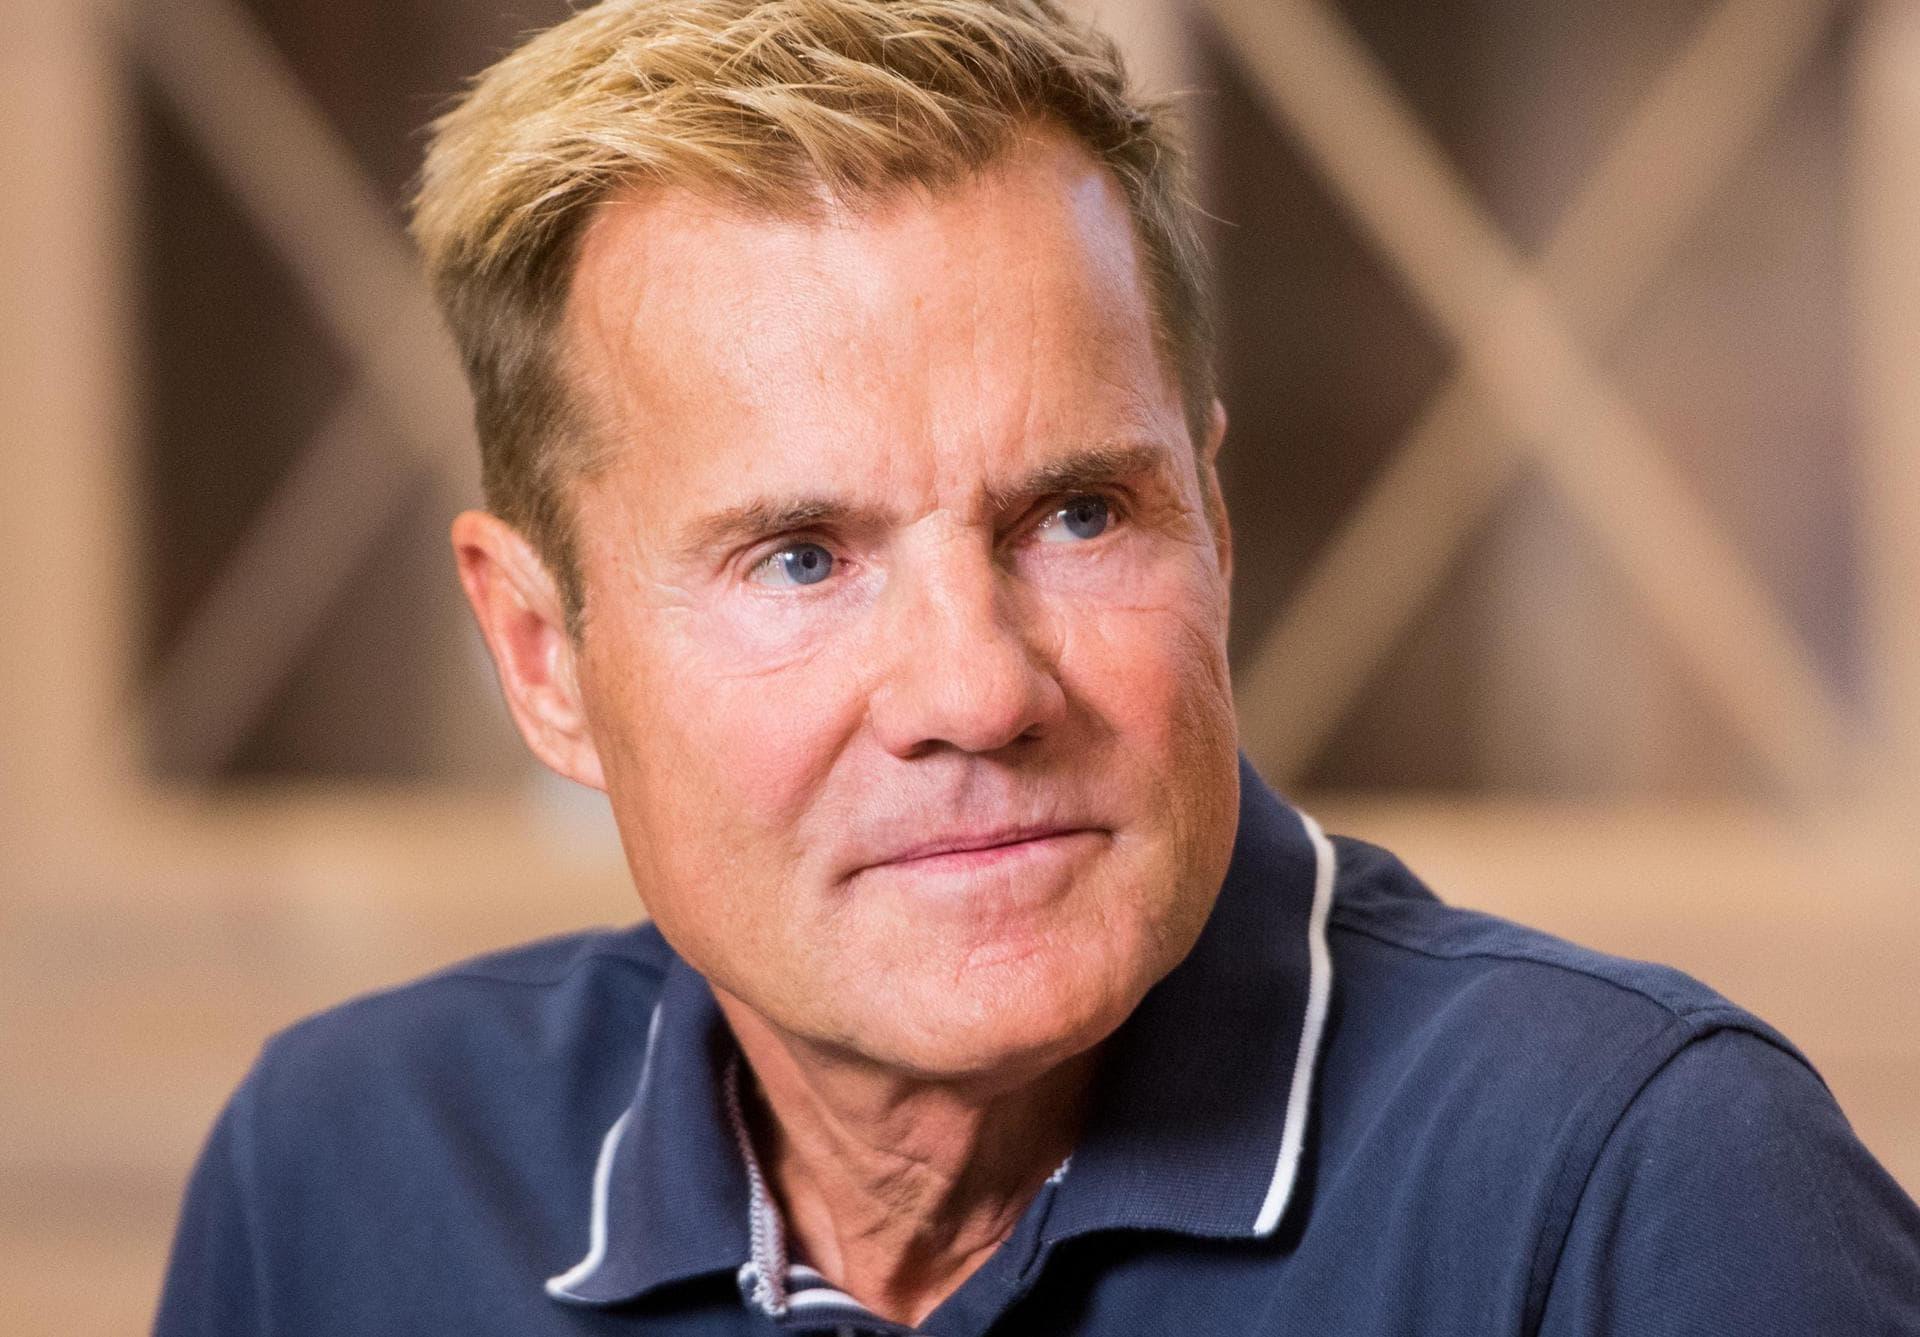 Dieter Bohlen hört bei «DSDS» auf Castingshow